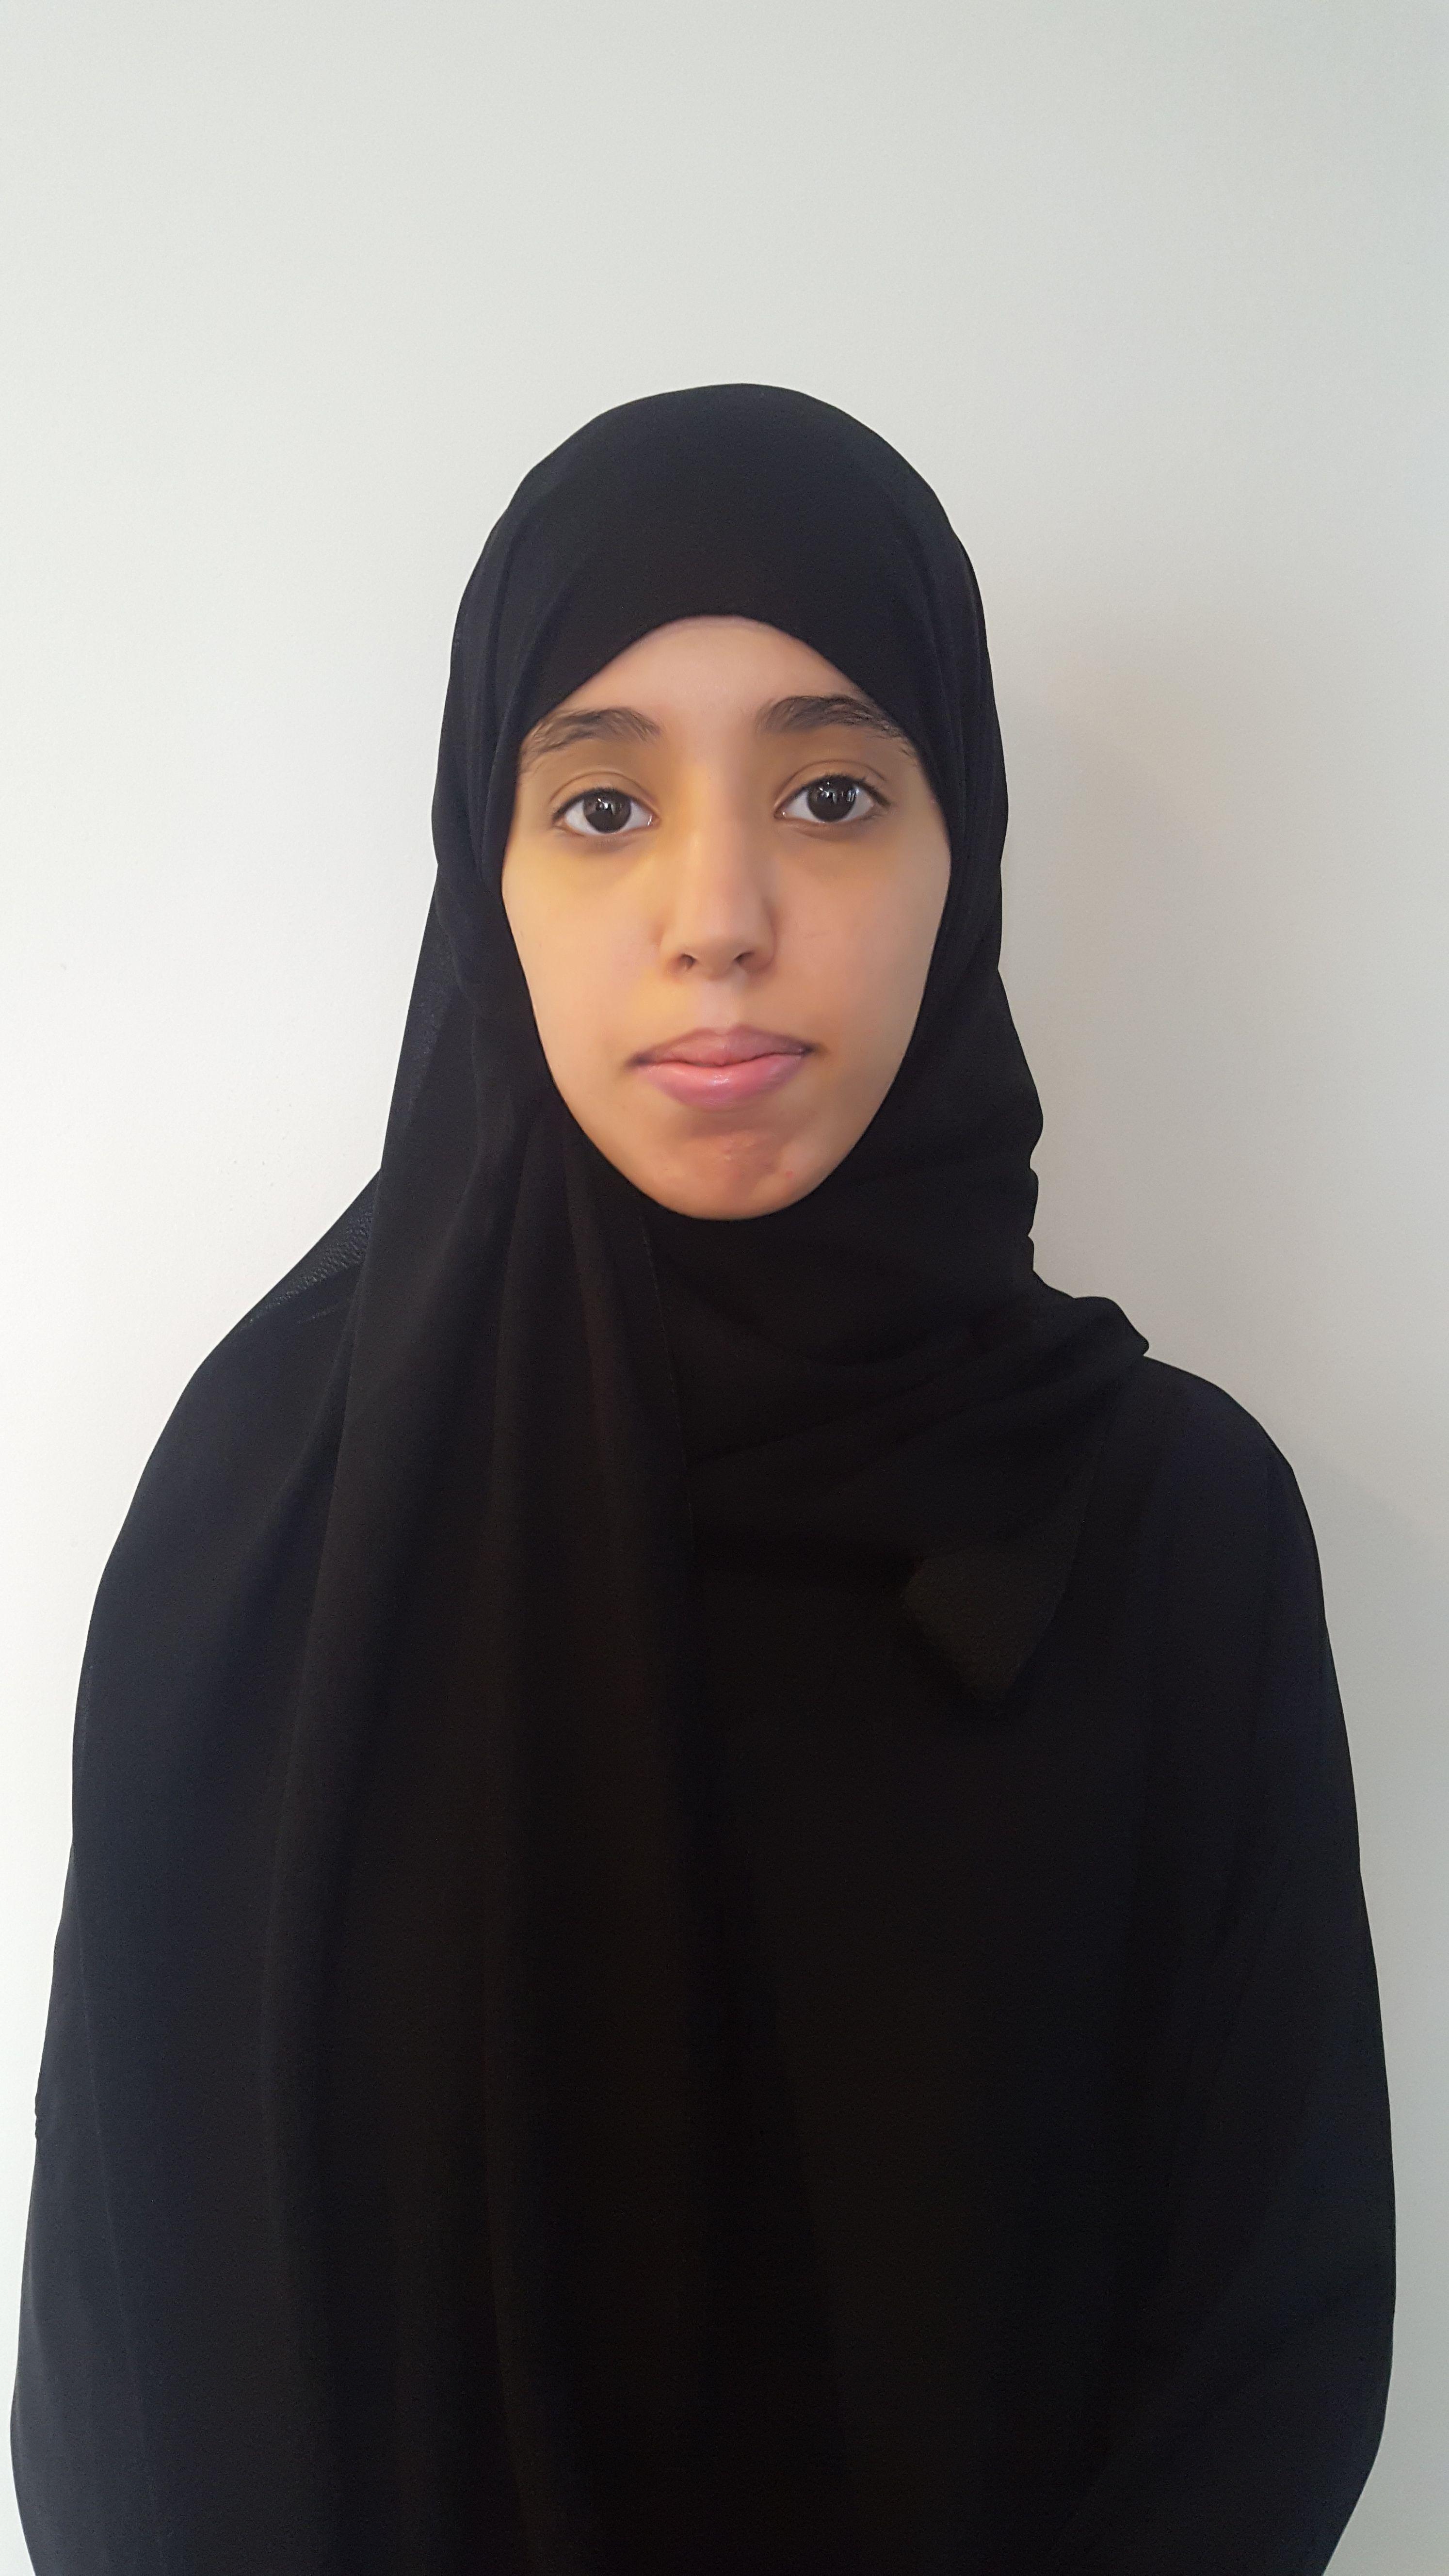 Student Spotlight: Rawan Alshehri, sophomore at Emory University